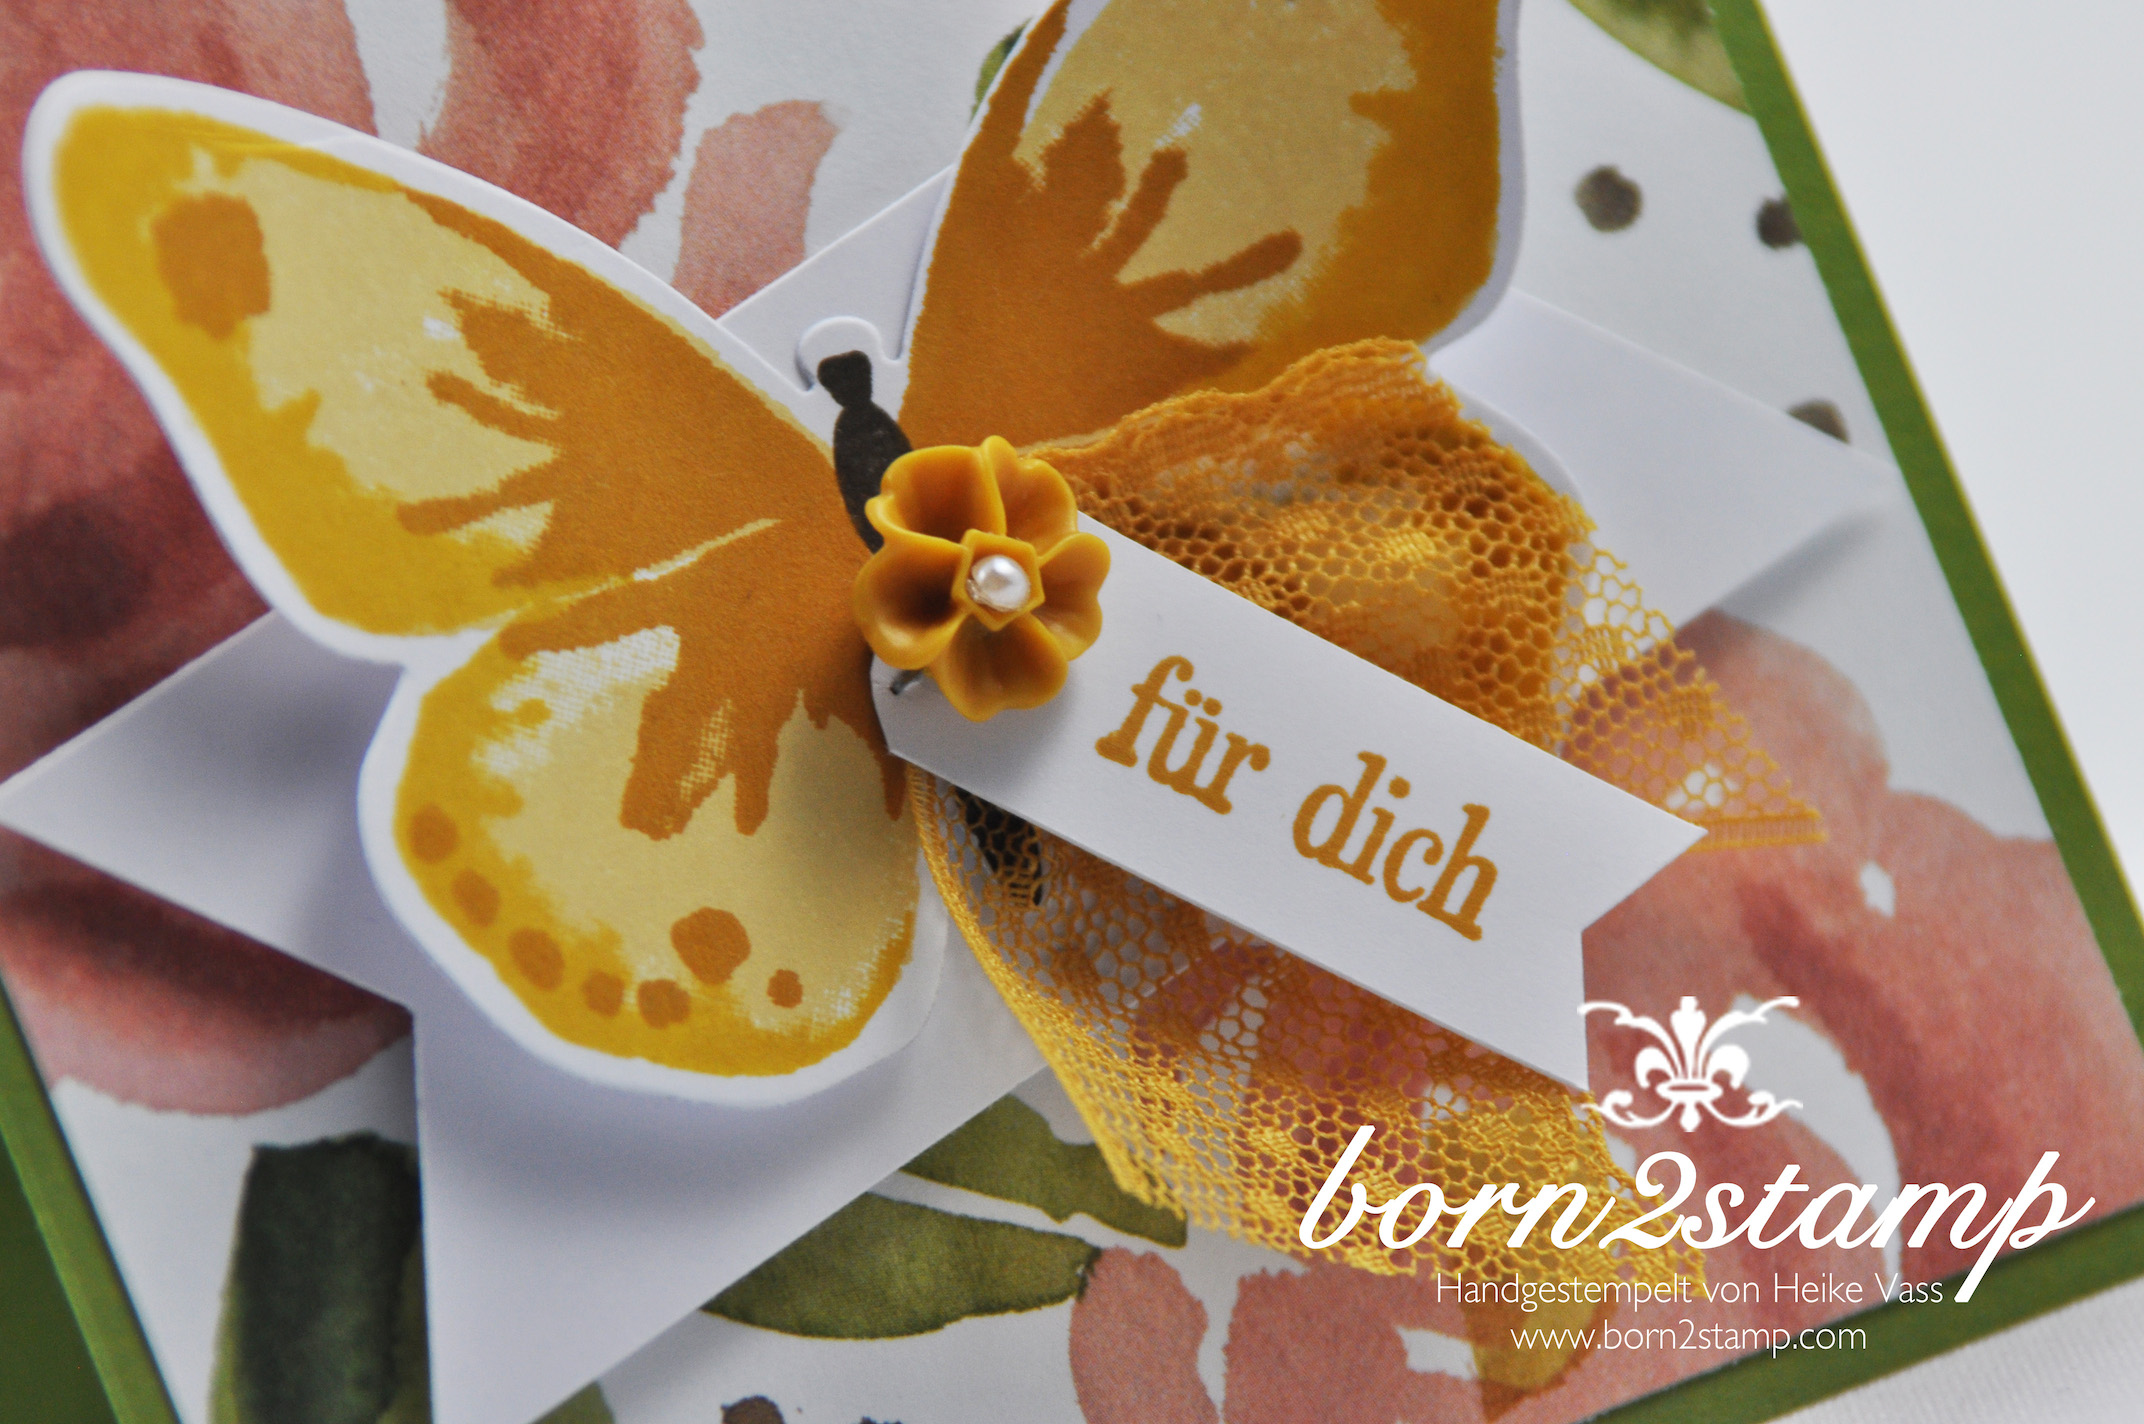 STAMPIN' UP! born2stamp Karte – DSP Englischer Garten – Watercolor Wings – Geburtstagsgruesse fuer dich – Framelits Bold Butterfly – Puenktchen-Spitzenband – InColor Accessoires